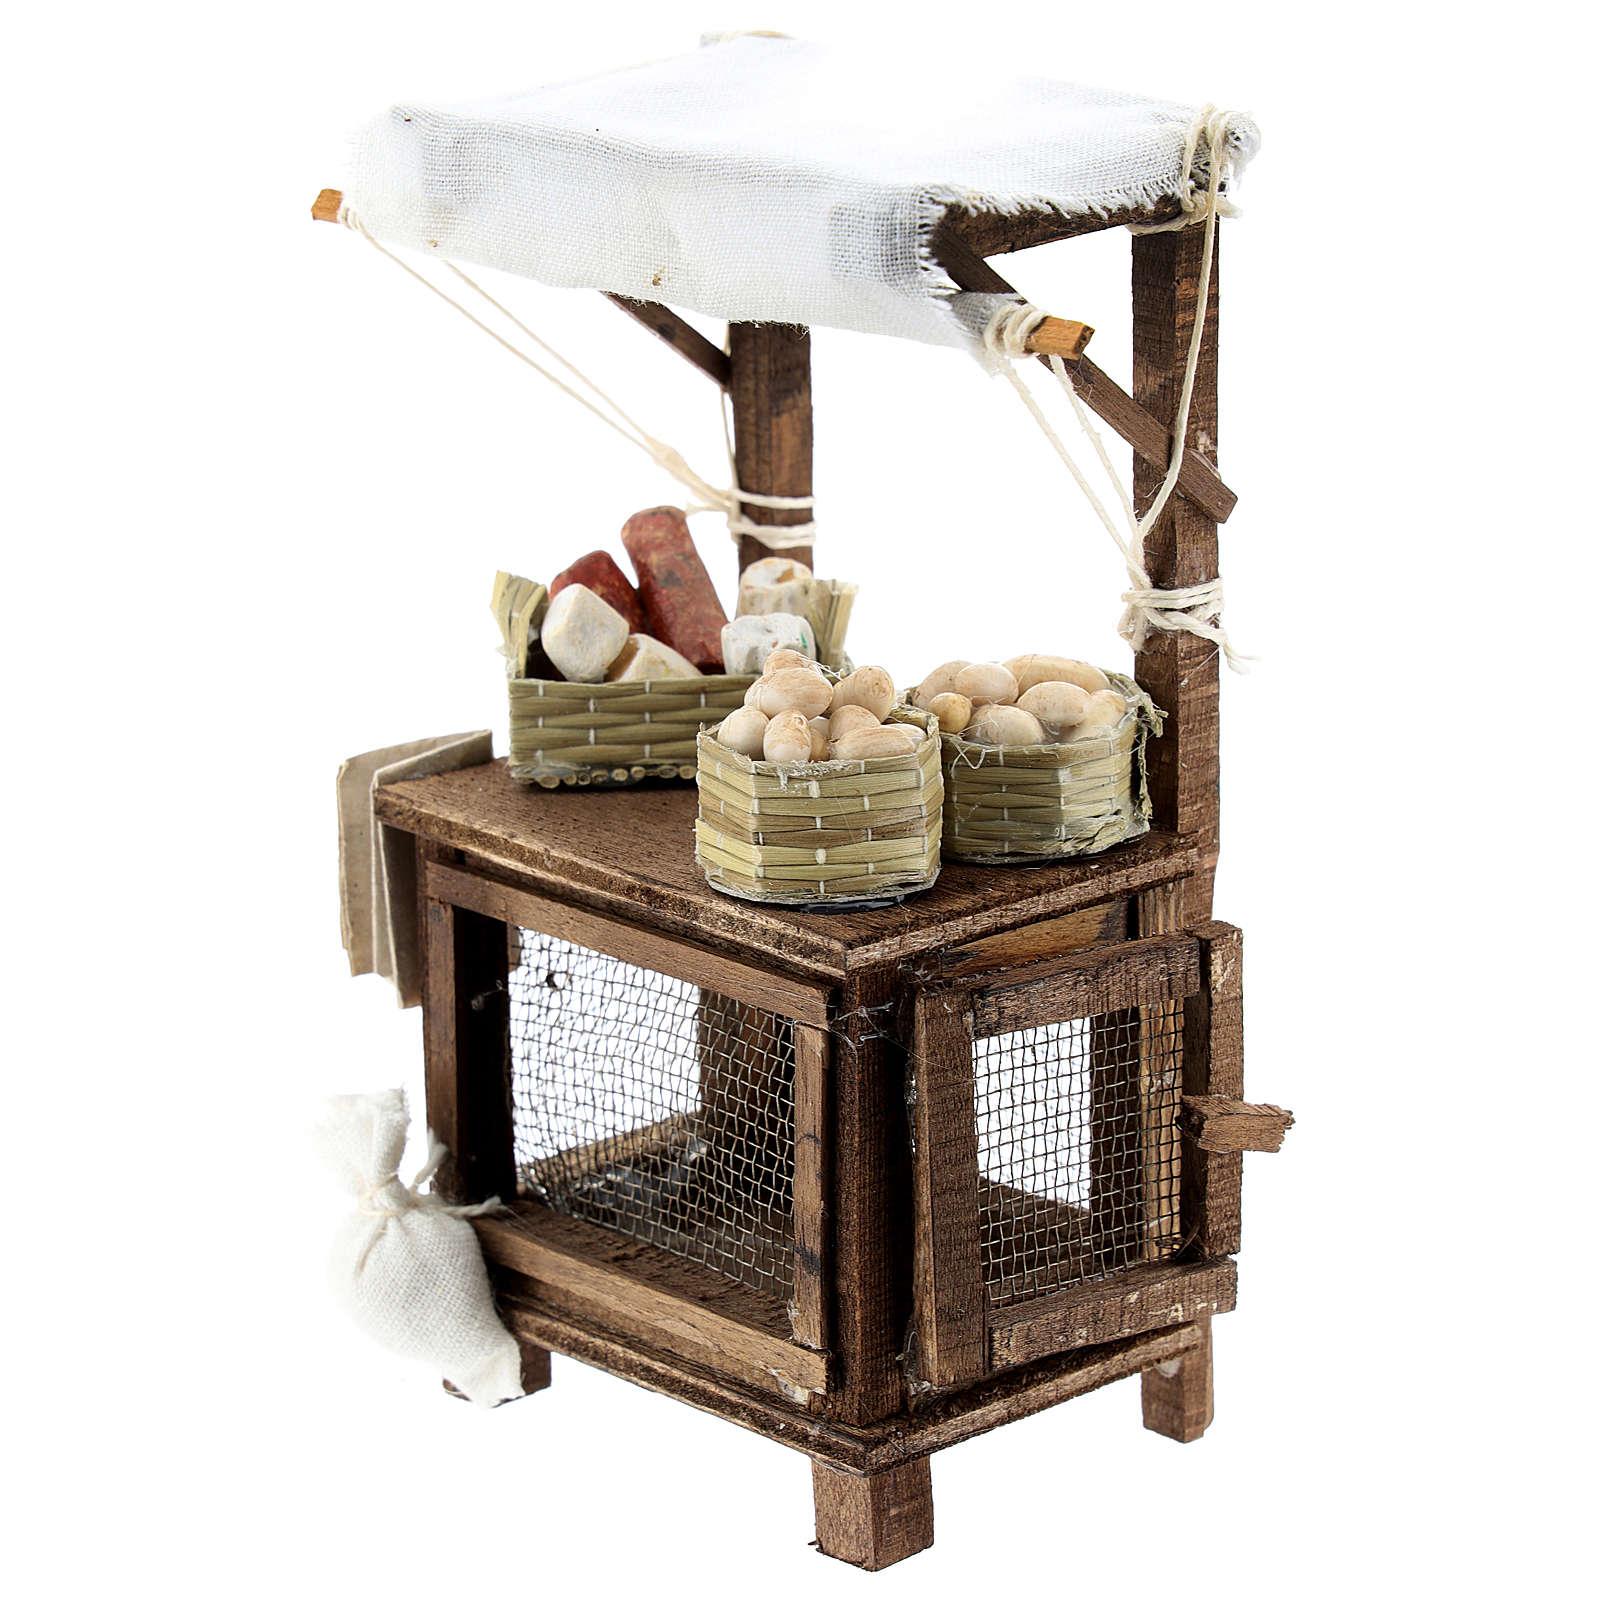 Mostrador vendedor de huevos para belén napolitano de 6-8 cm 4